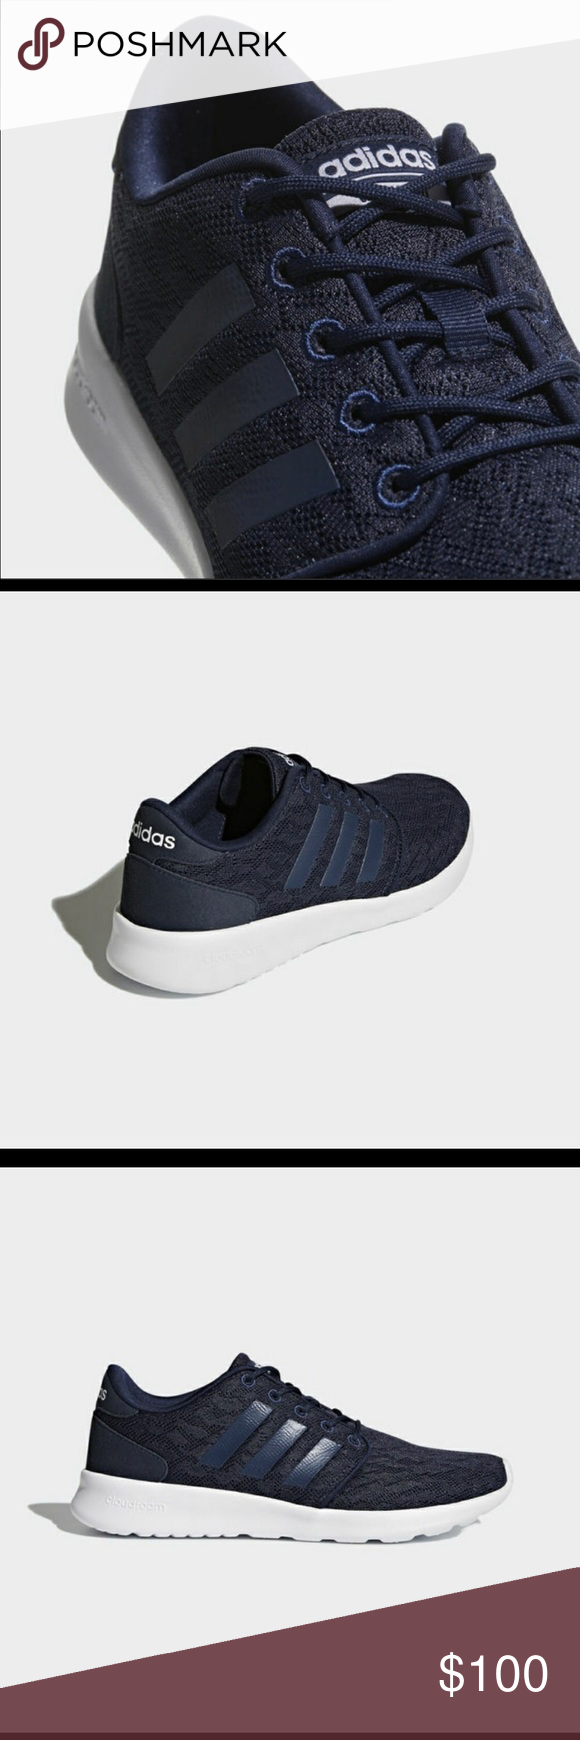 b8728950ba4 Adidas cloudfoam qt racer shoes BB9846 Adidas women s shoes adidas Shoes  Athletic Shoes